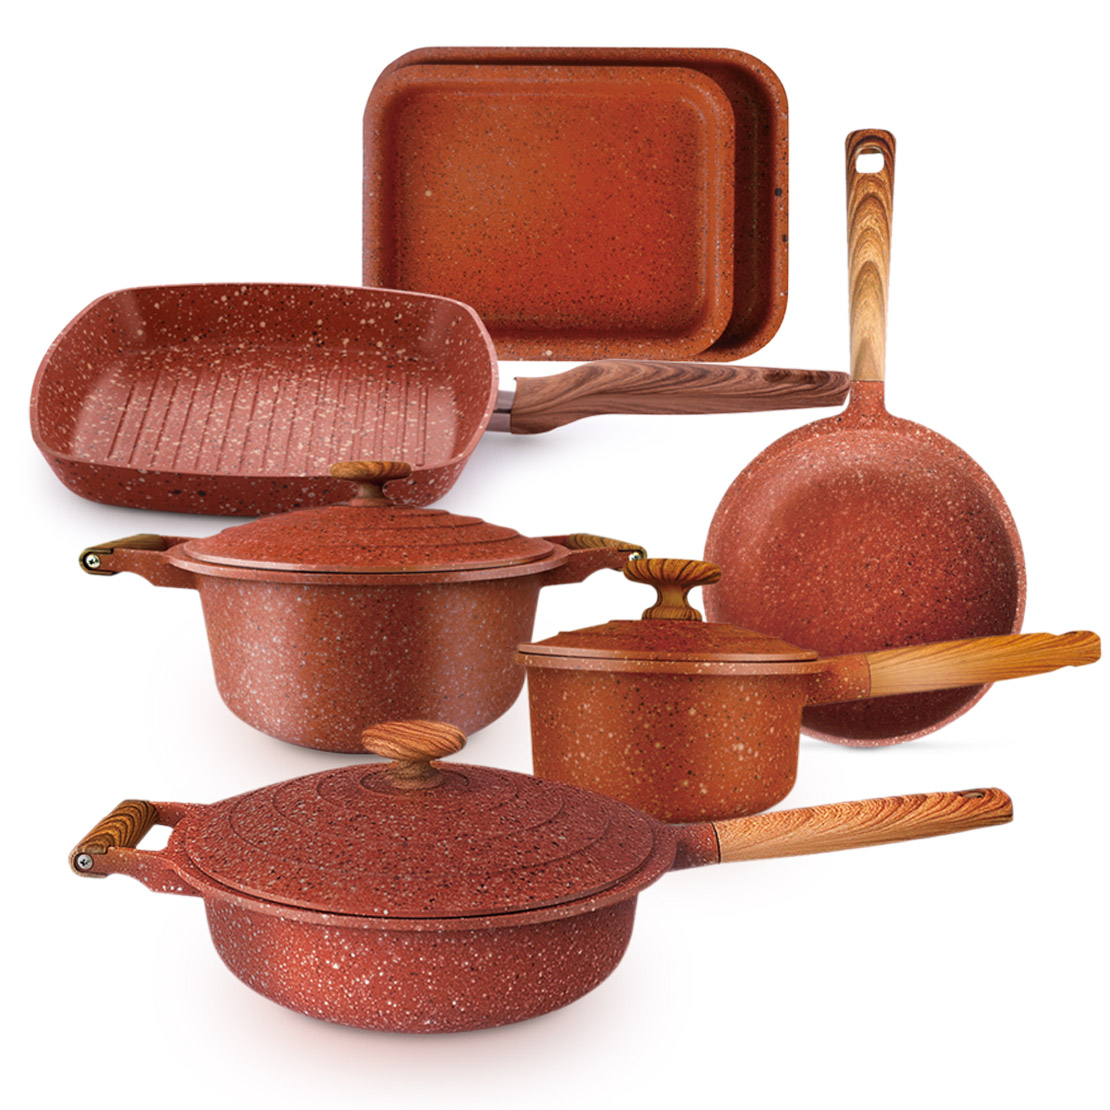 G1019 Granite Cookware Set 10 Piece - Red